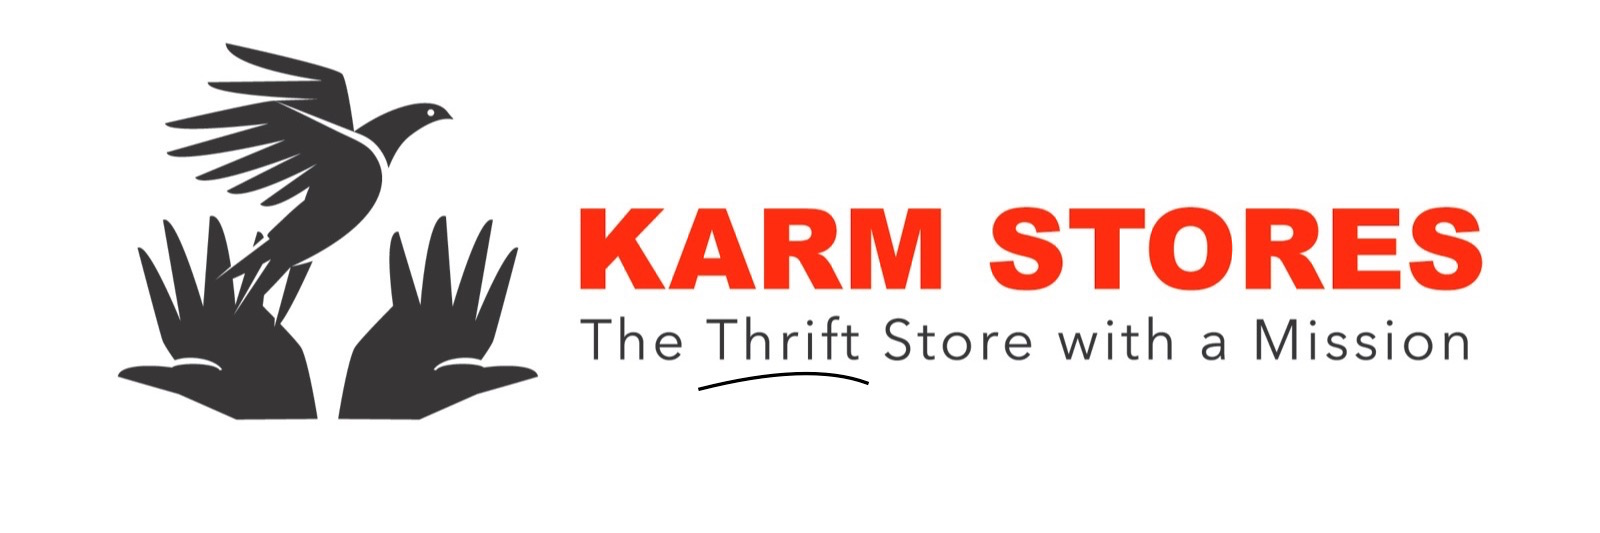 KARM-Stores-logo-Thrift-1600x533.jpg